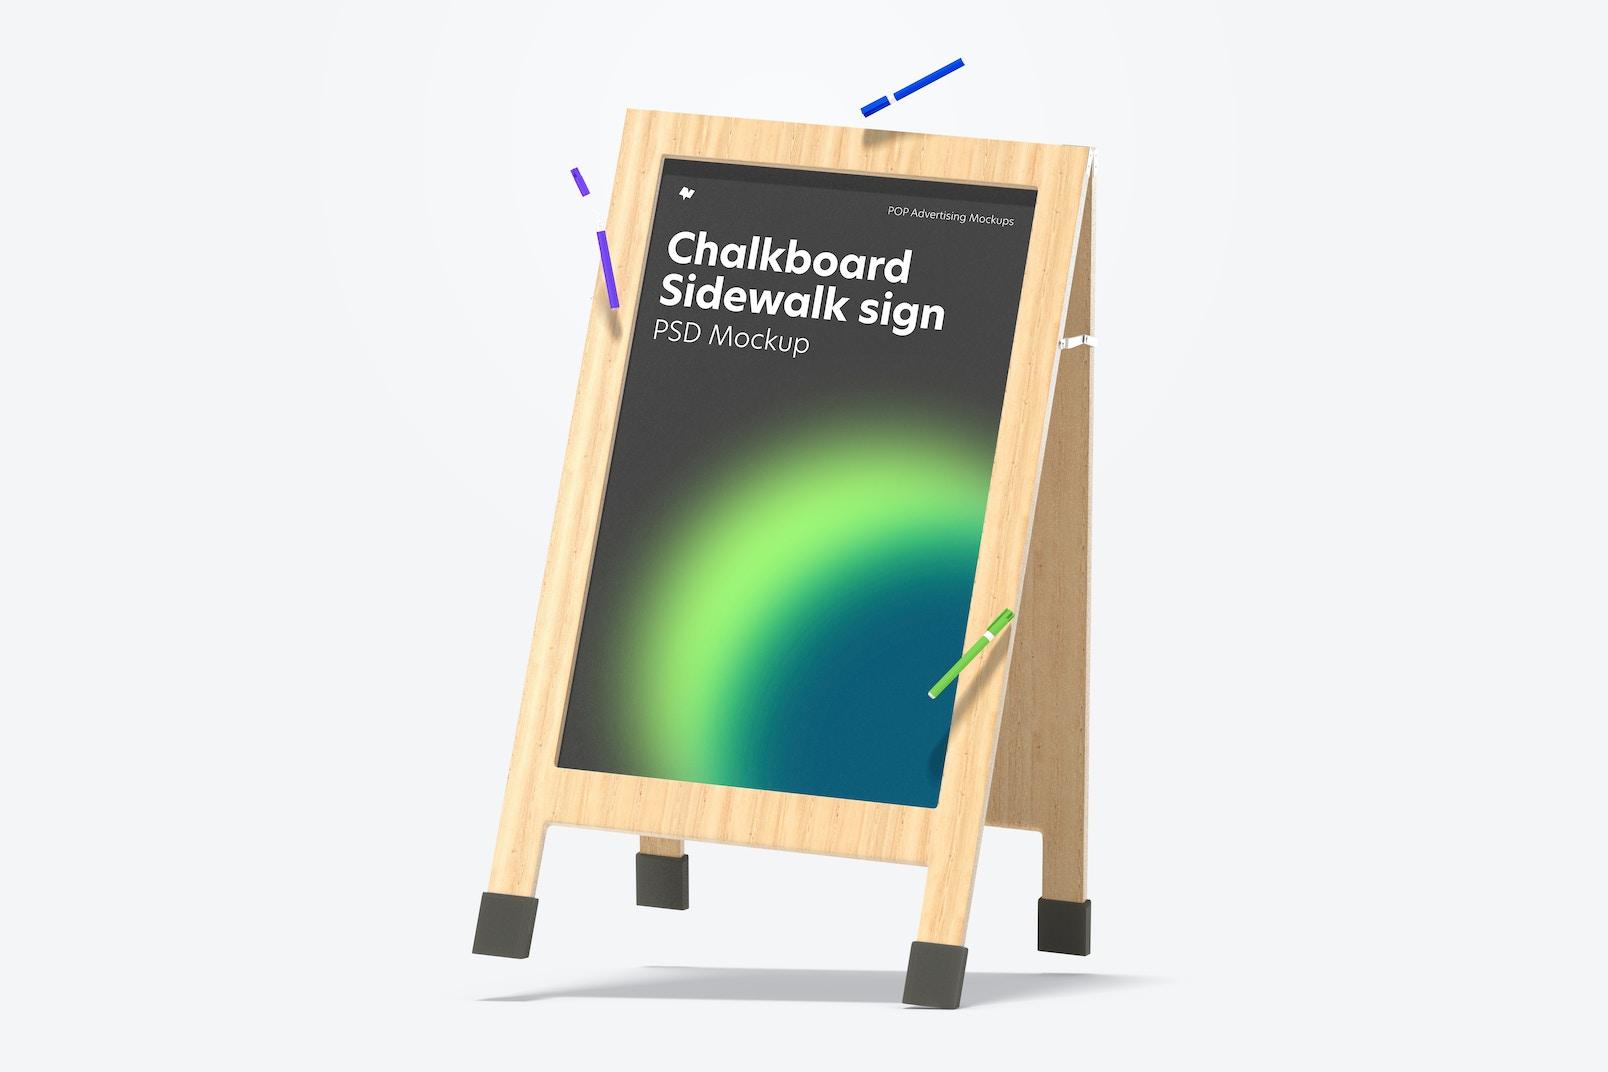 Chalkboard Sidewalk Sign Mockup, Leaned